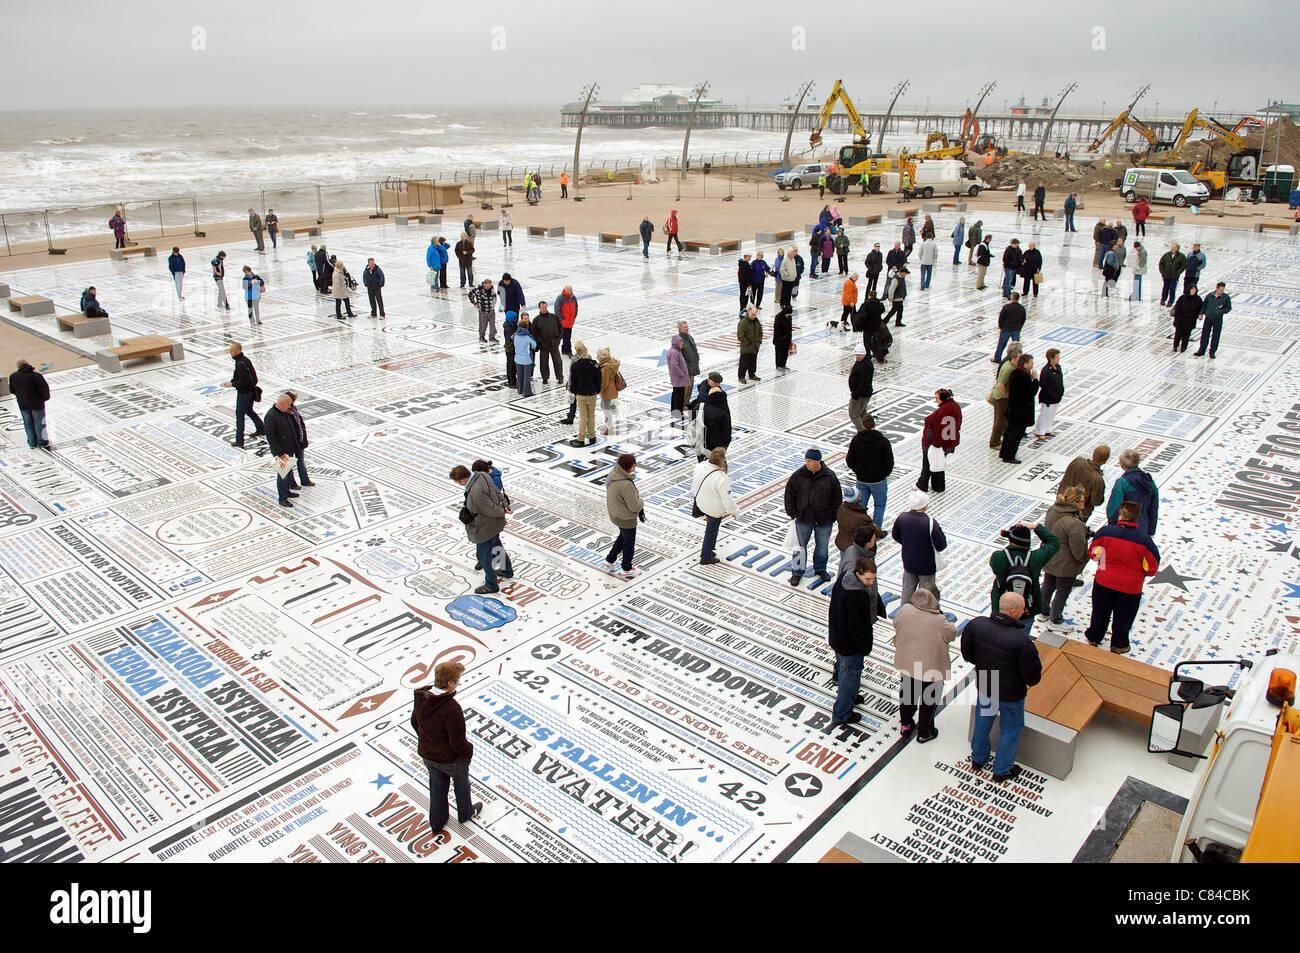 BLACKPOOL, UK, MON 10TH OCT, 2011. The Blackpool Comedy Carpet opens on the beachside resort's promenade. The - Stock Image